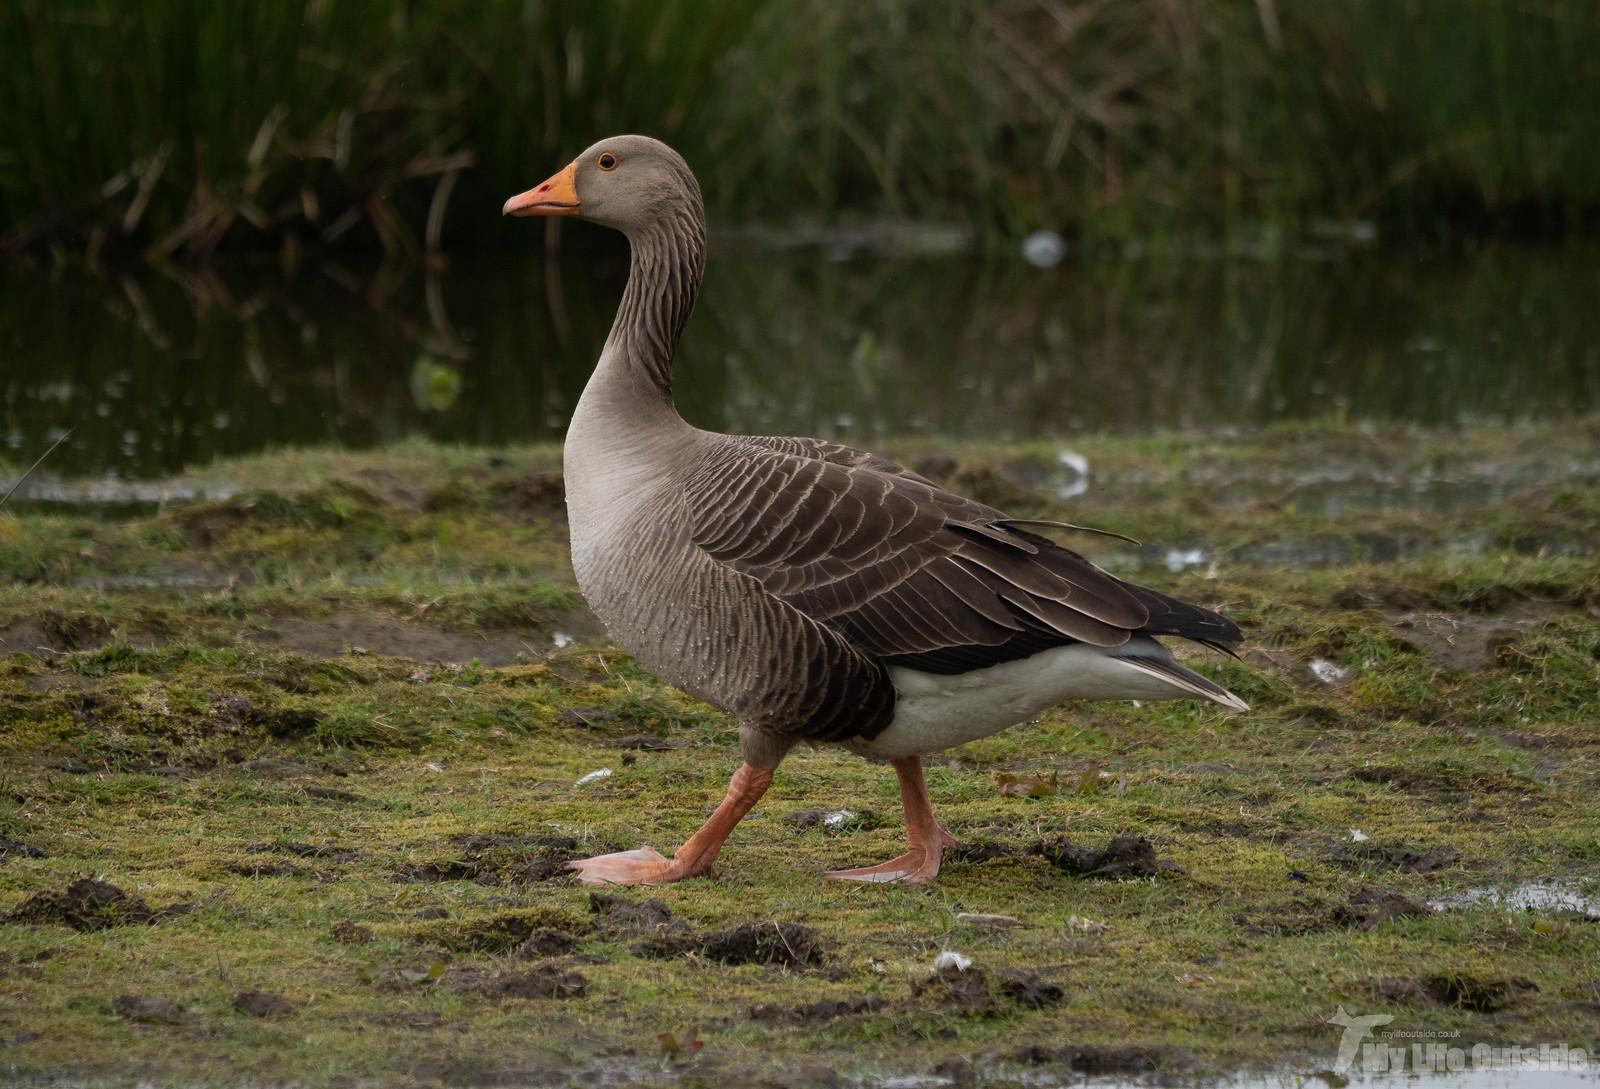 P5141986 - Greylag Goose, St Aidan's